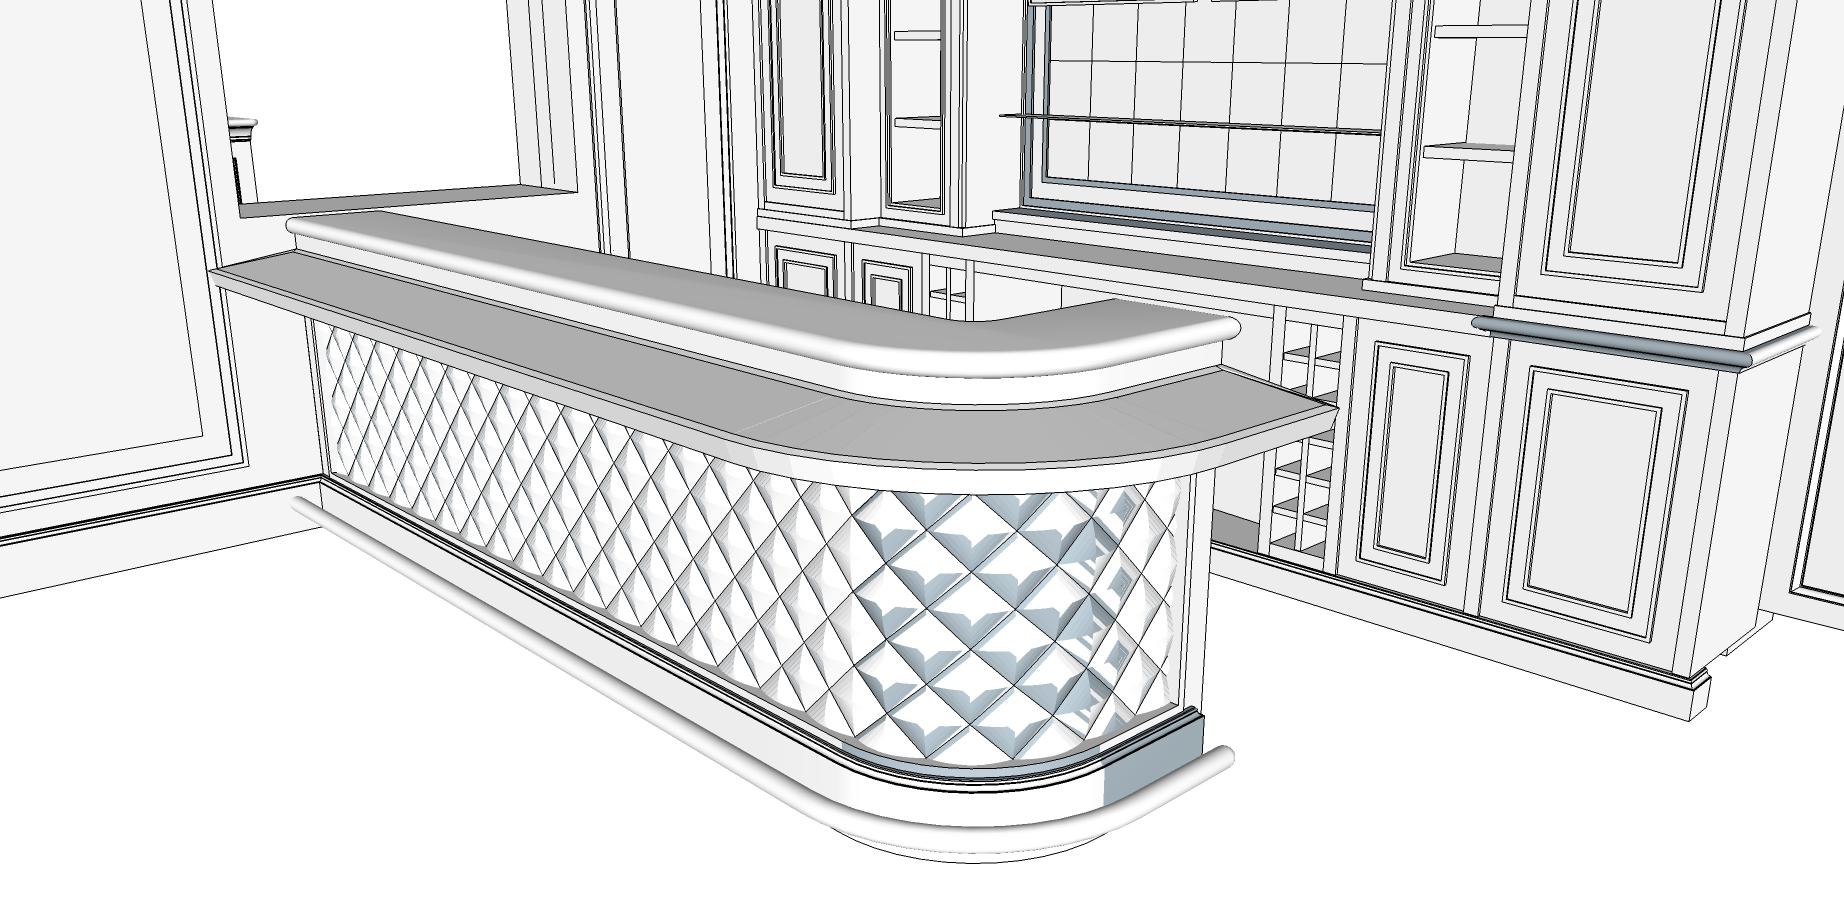 Bespoke Bar design sketch